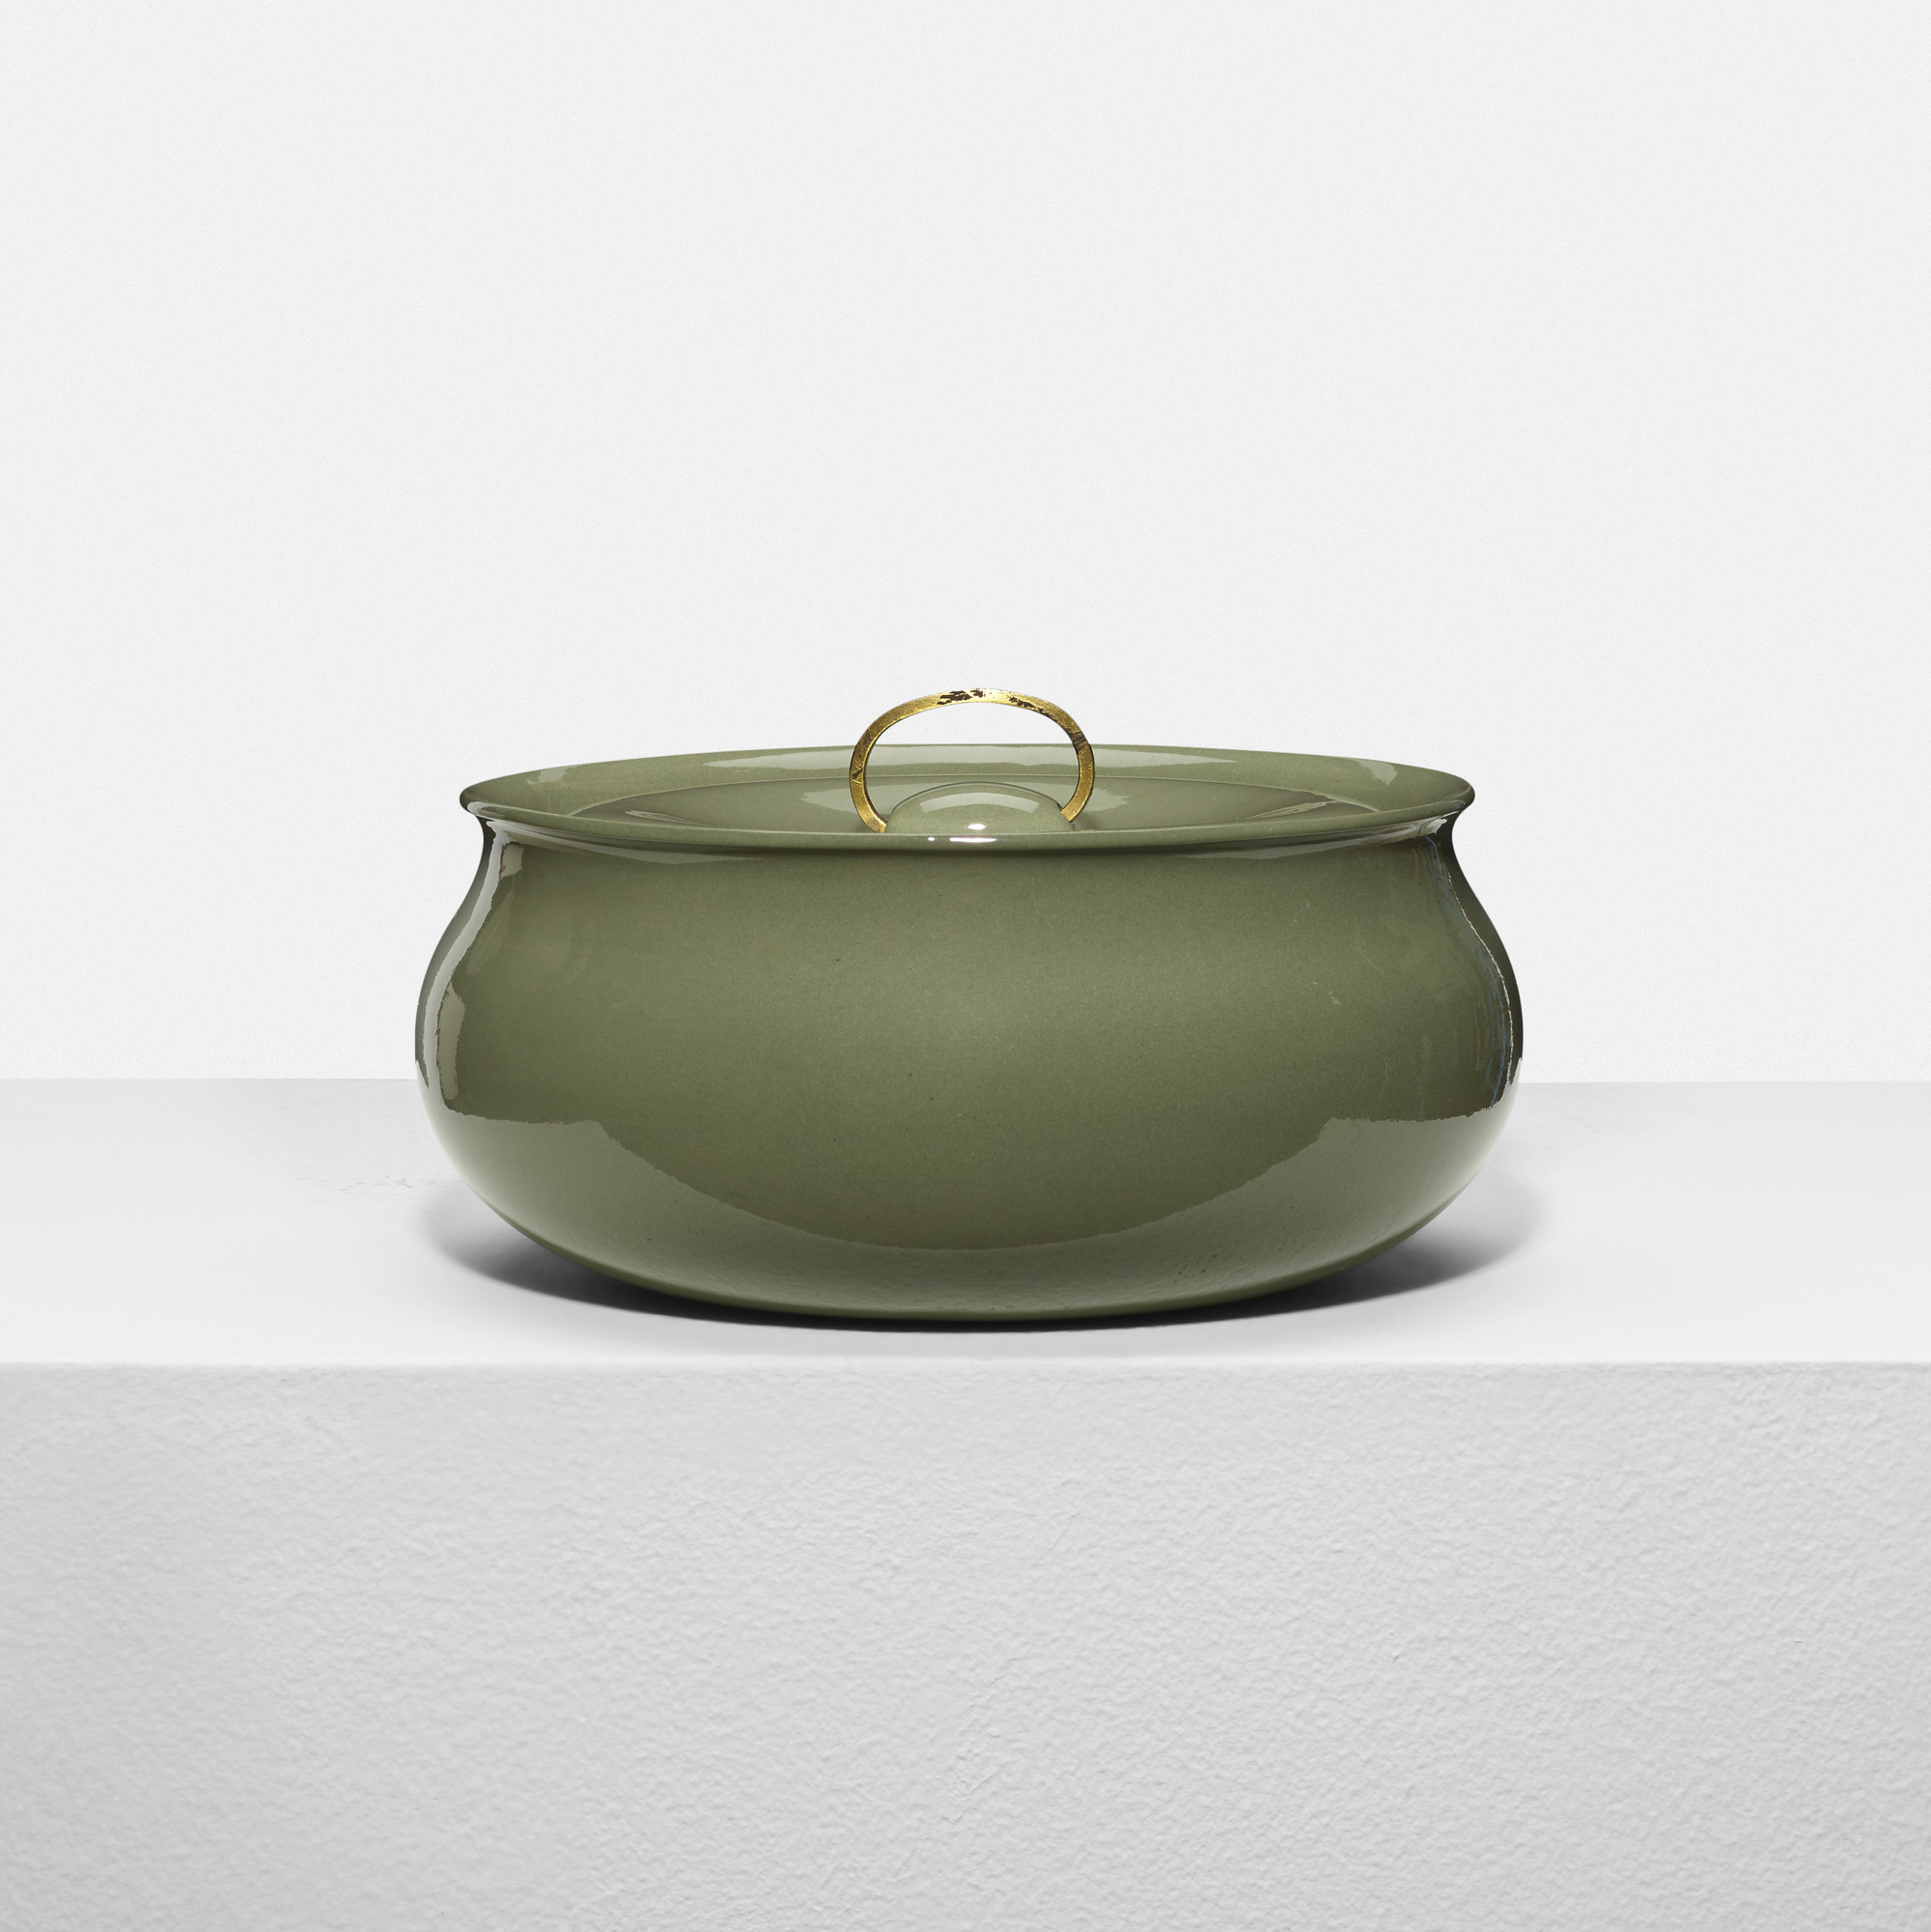 334: Eva Zeisel / lidded casserole dish (1 of 2)